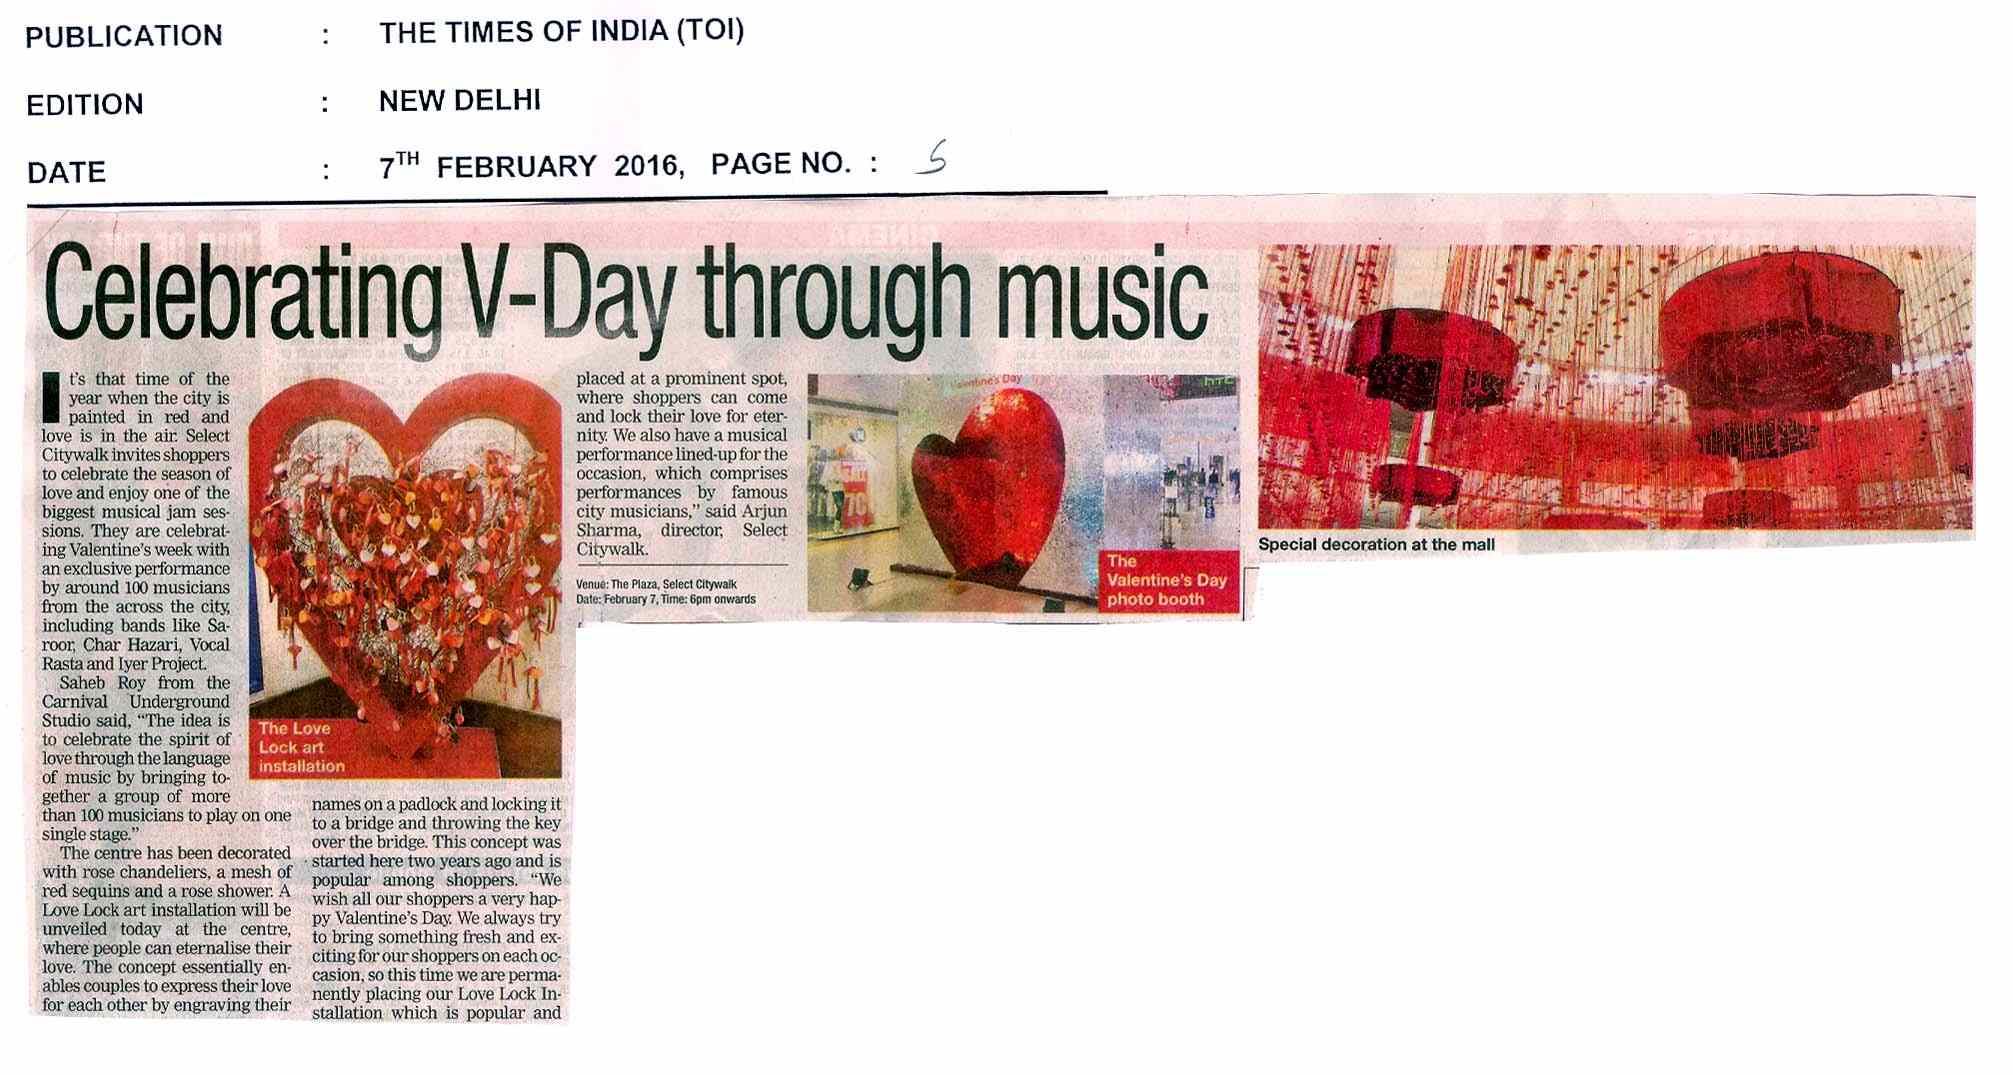 Celebrating V-Day through music